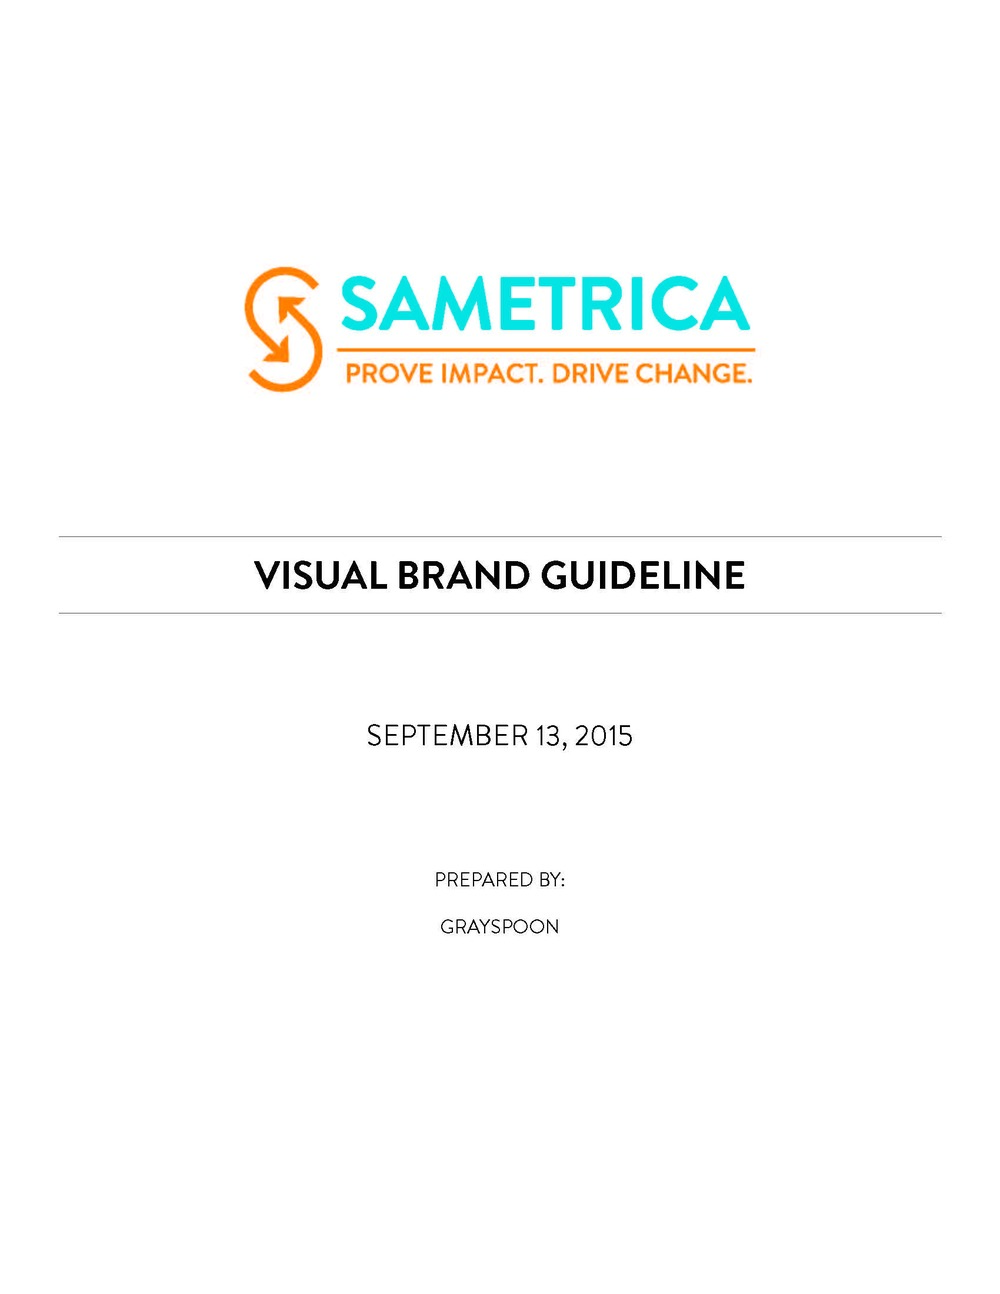 150911_SAMETRICA Brand Guideline_Page_01.jpg